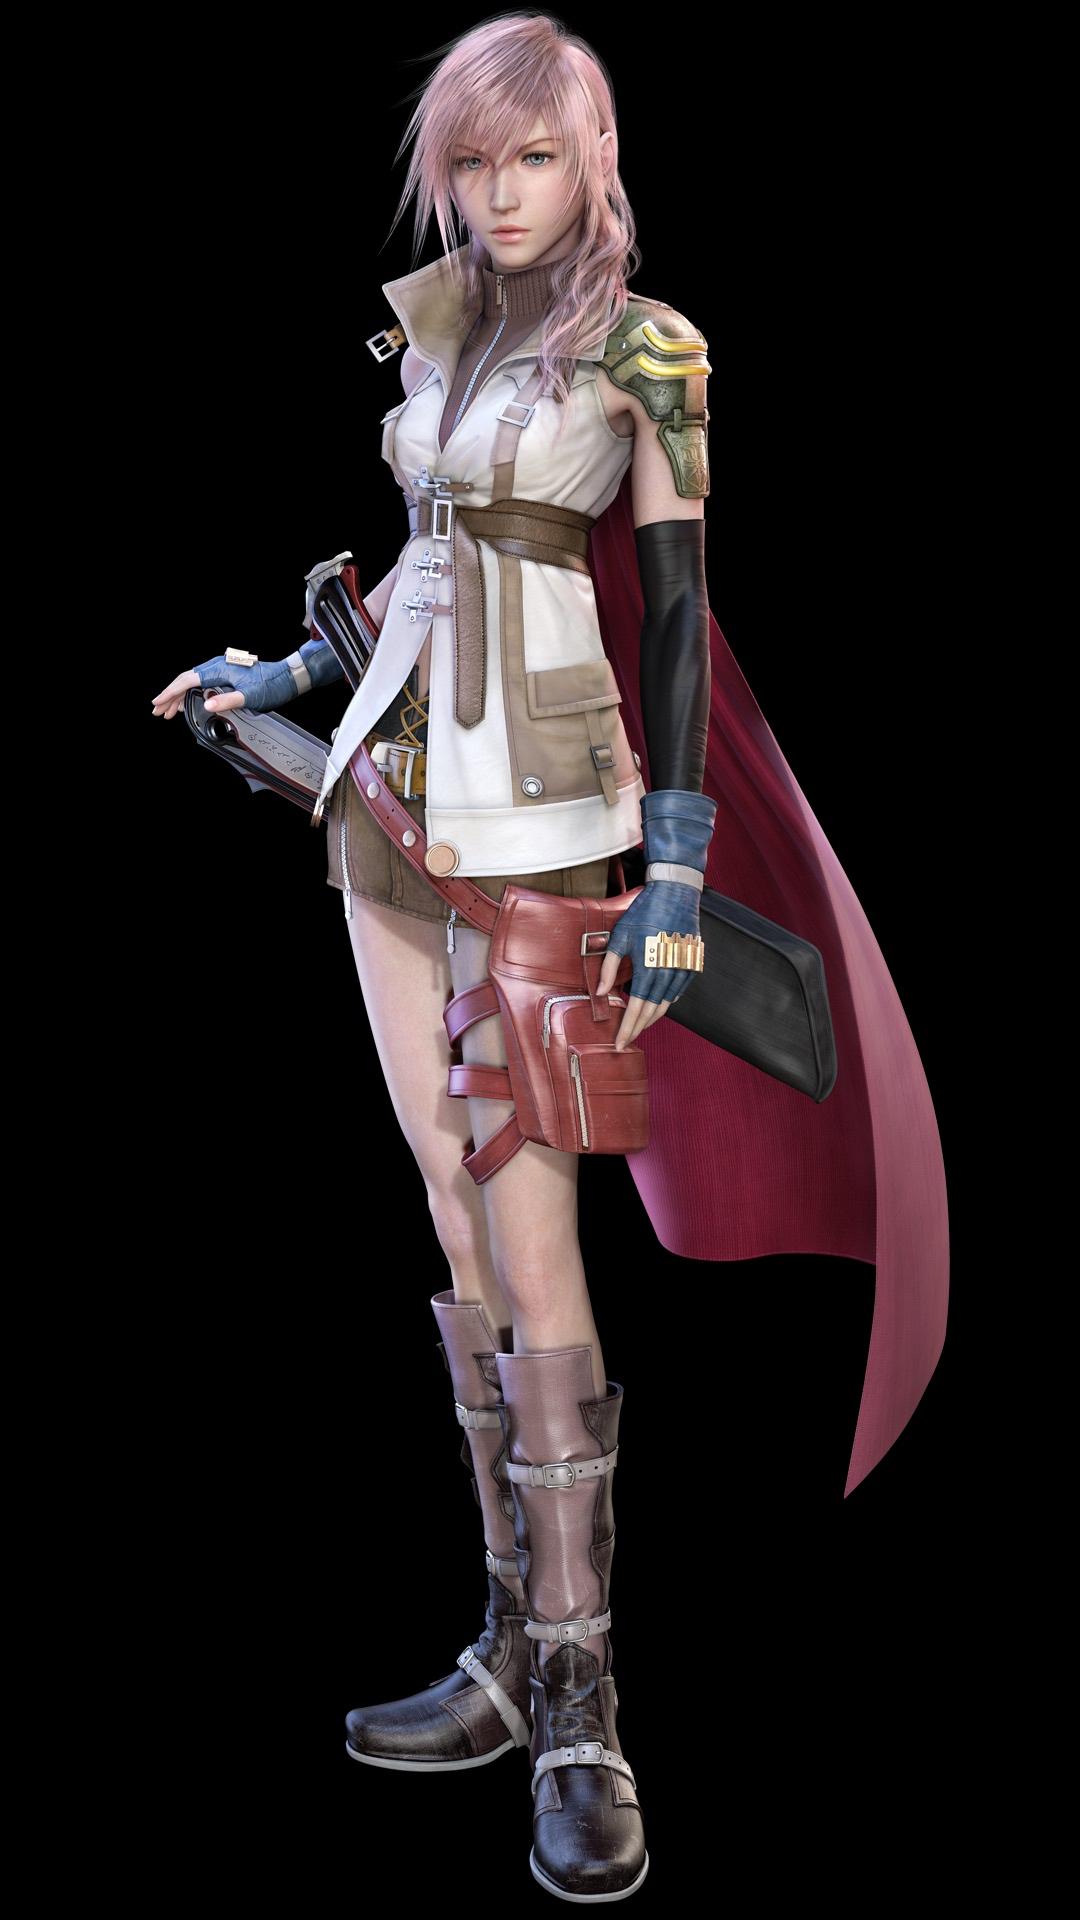 Final Fantasy Png - Download Final Fantasy Png Images Transparent Gallery. Advertisement, Transparent background PNG HD thumbnail